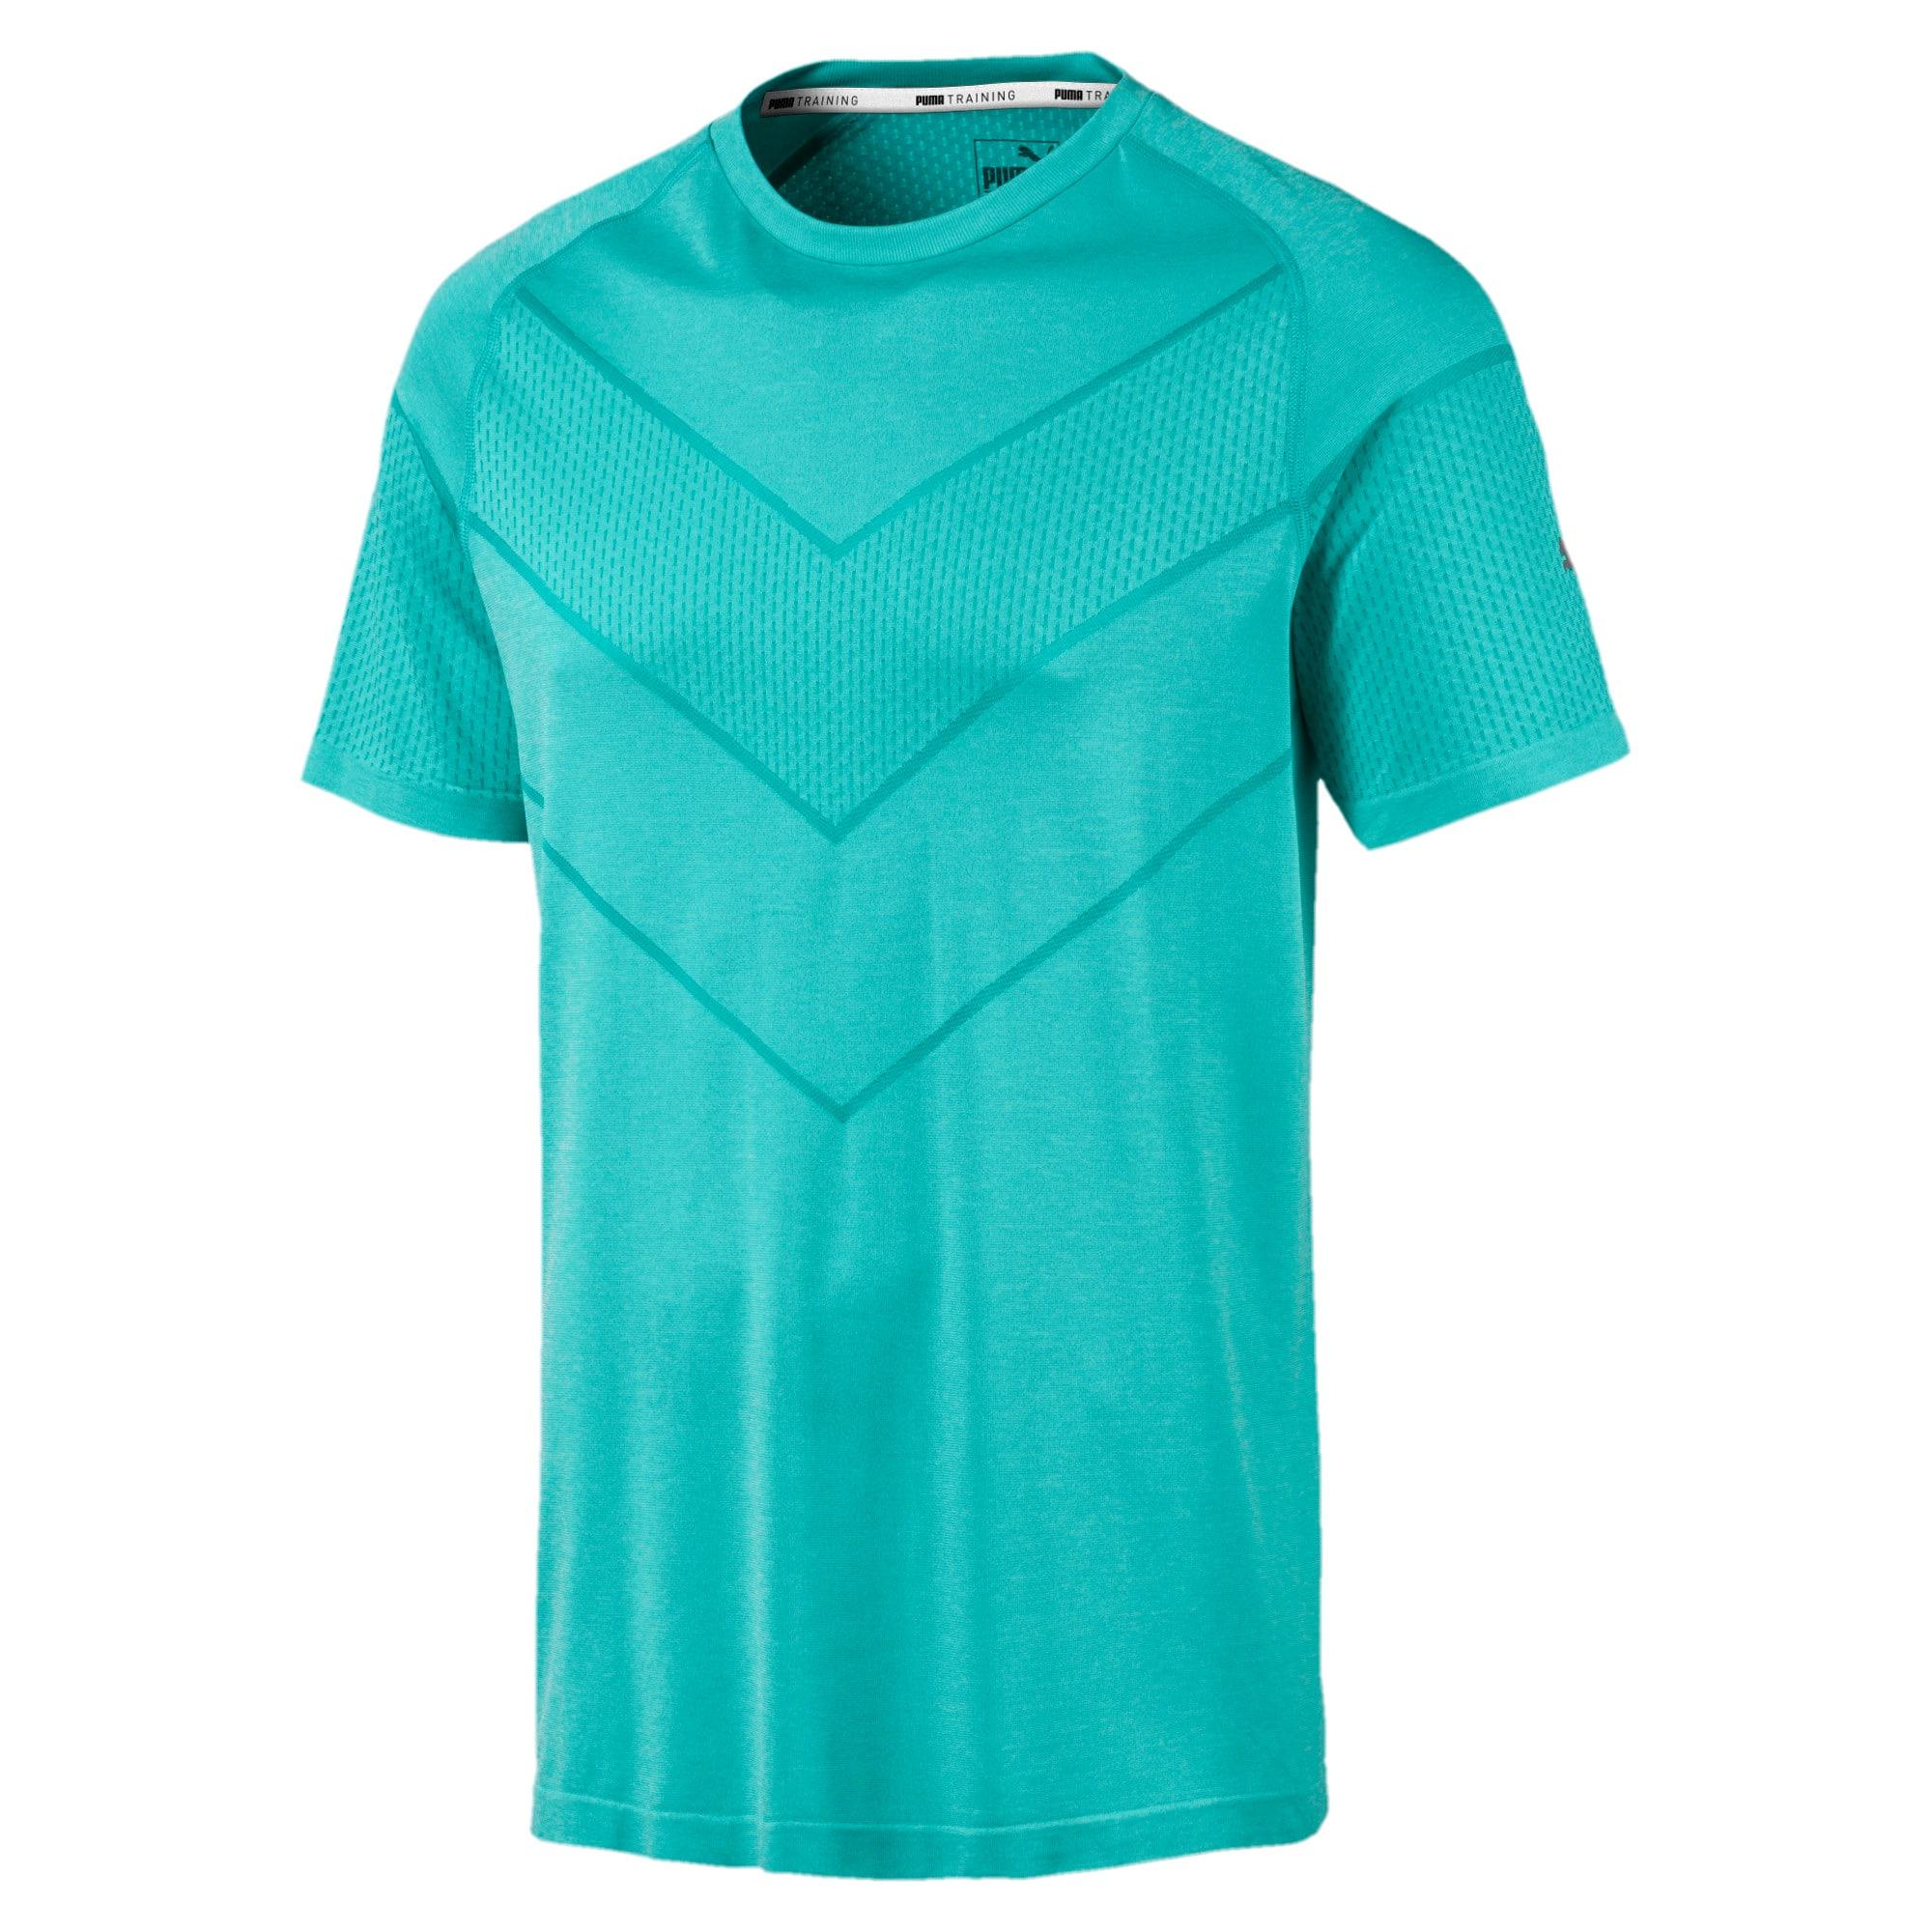 Thumbnail 4 of Reactive evoKNIT Men's Tee, Blue Turquoise Heather, medium